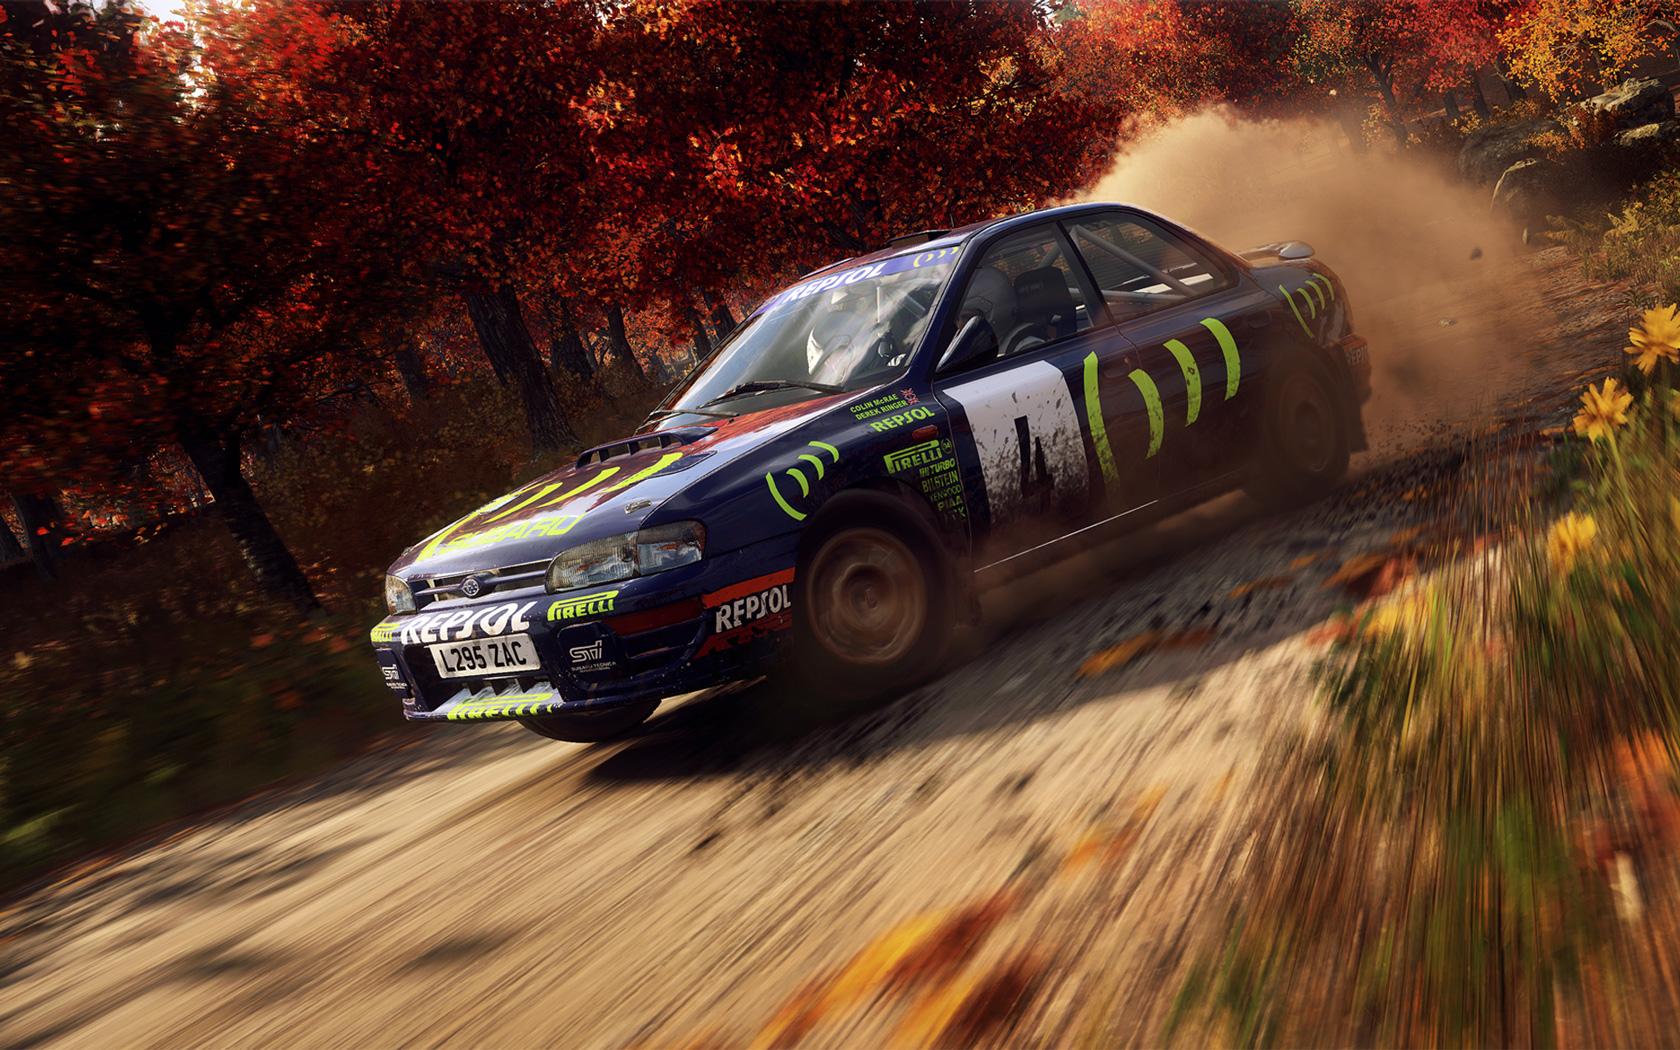 Dirt Rally 2.0 Wallpaper in 1680x1050